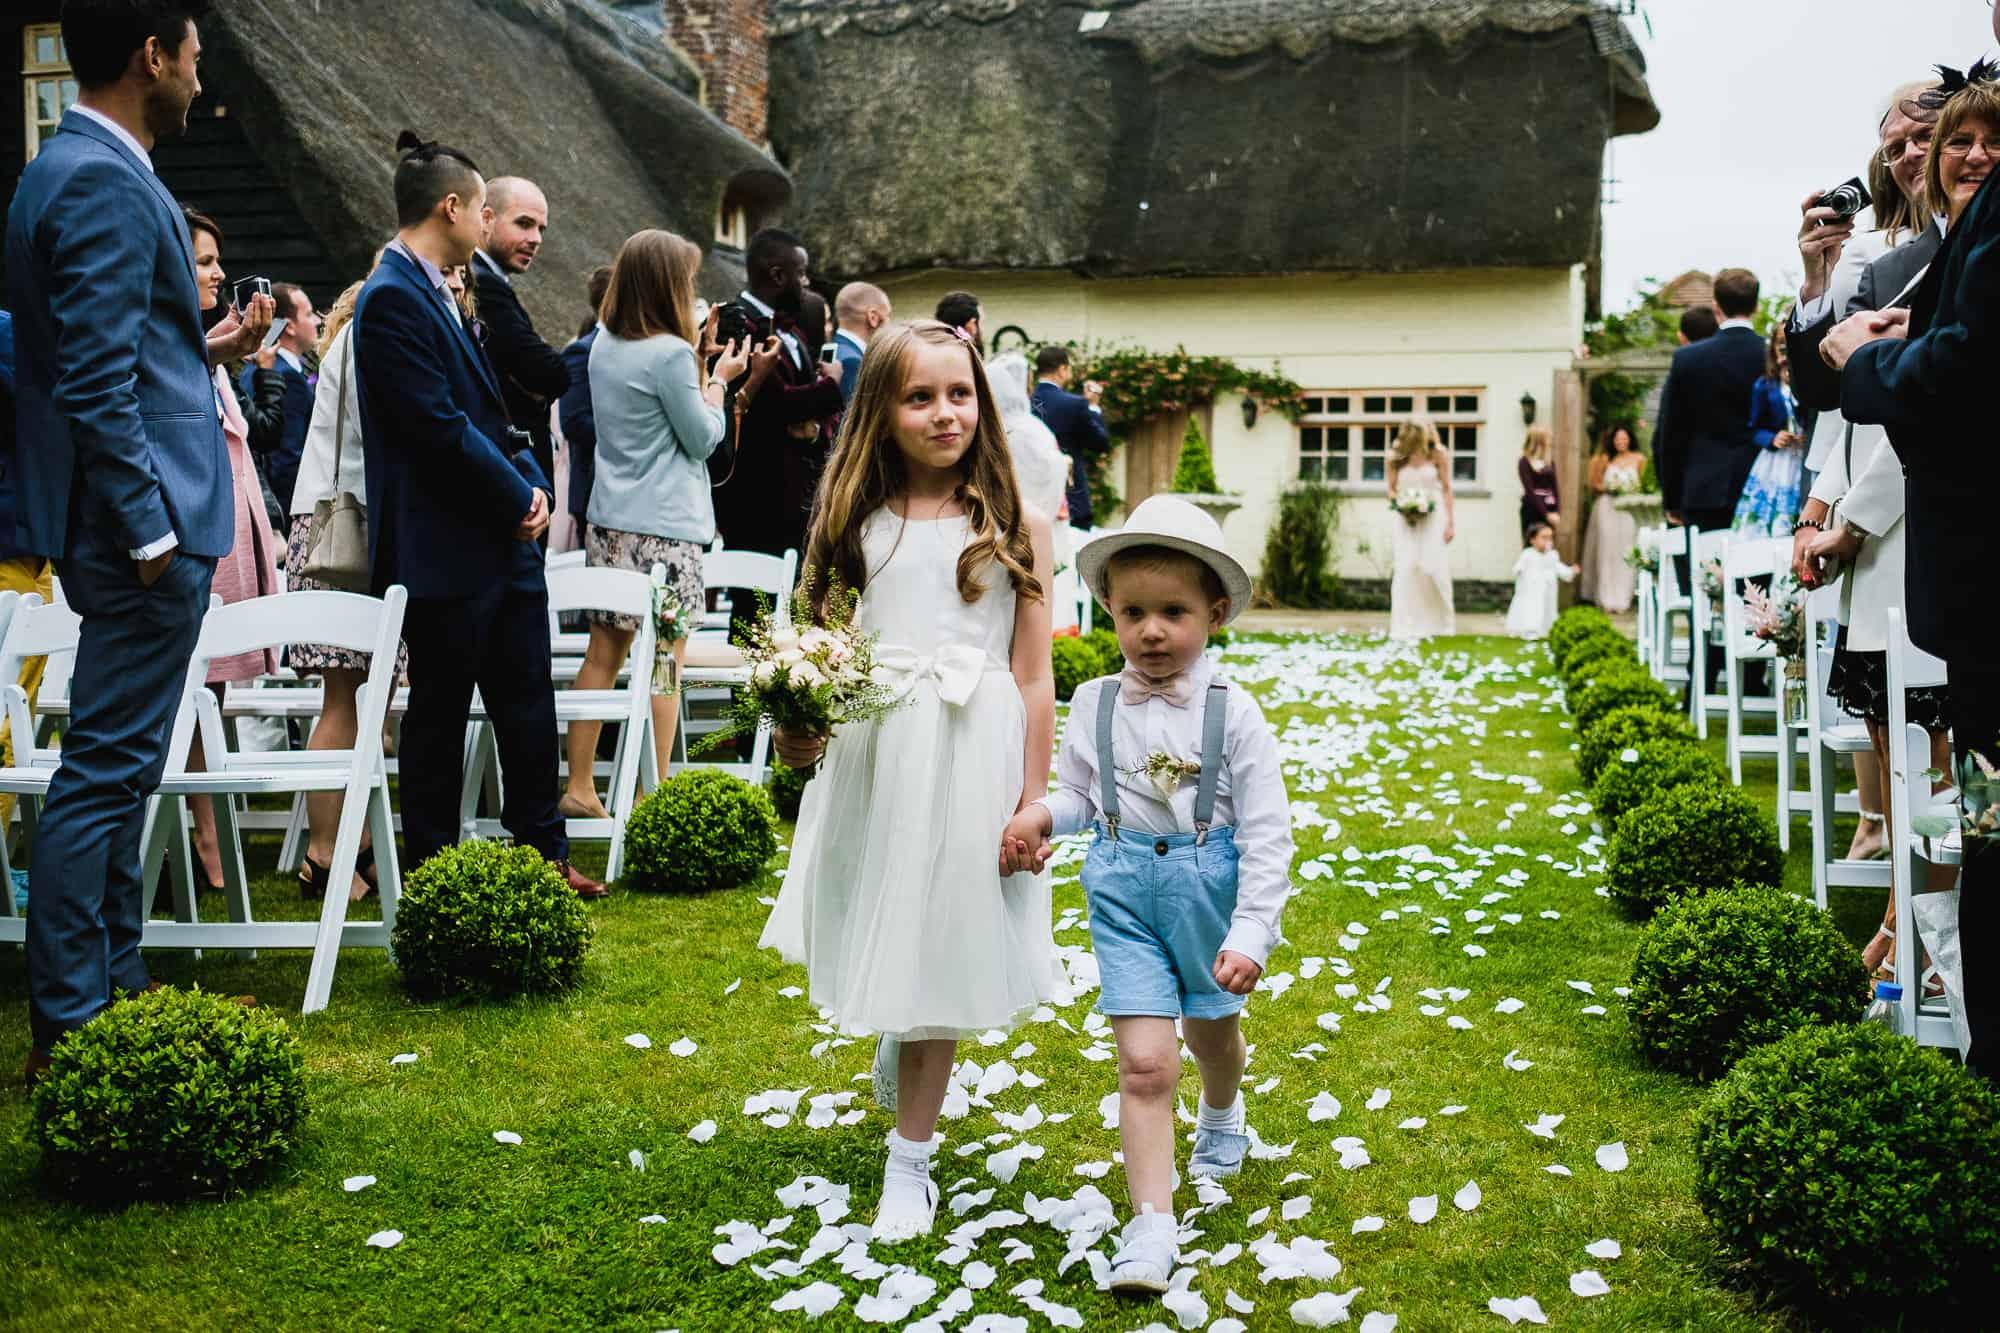 marleybrook-house-wedding-photography-matt-tyler-0023